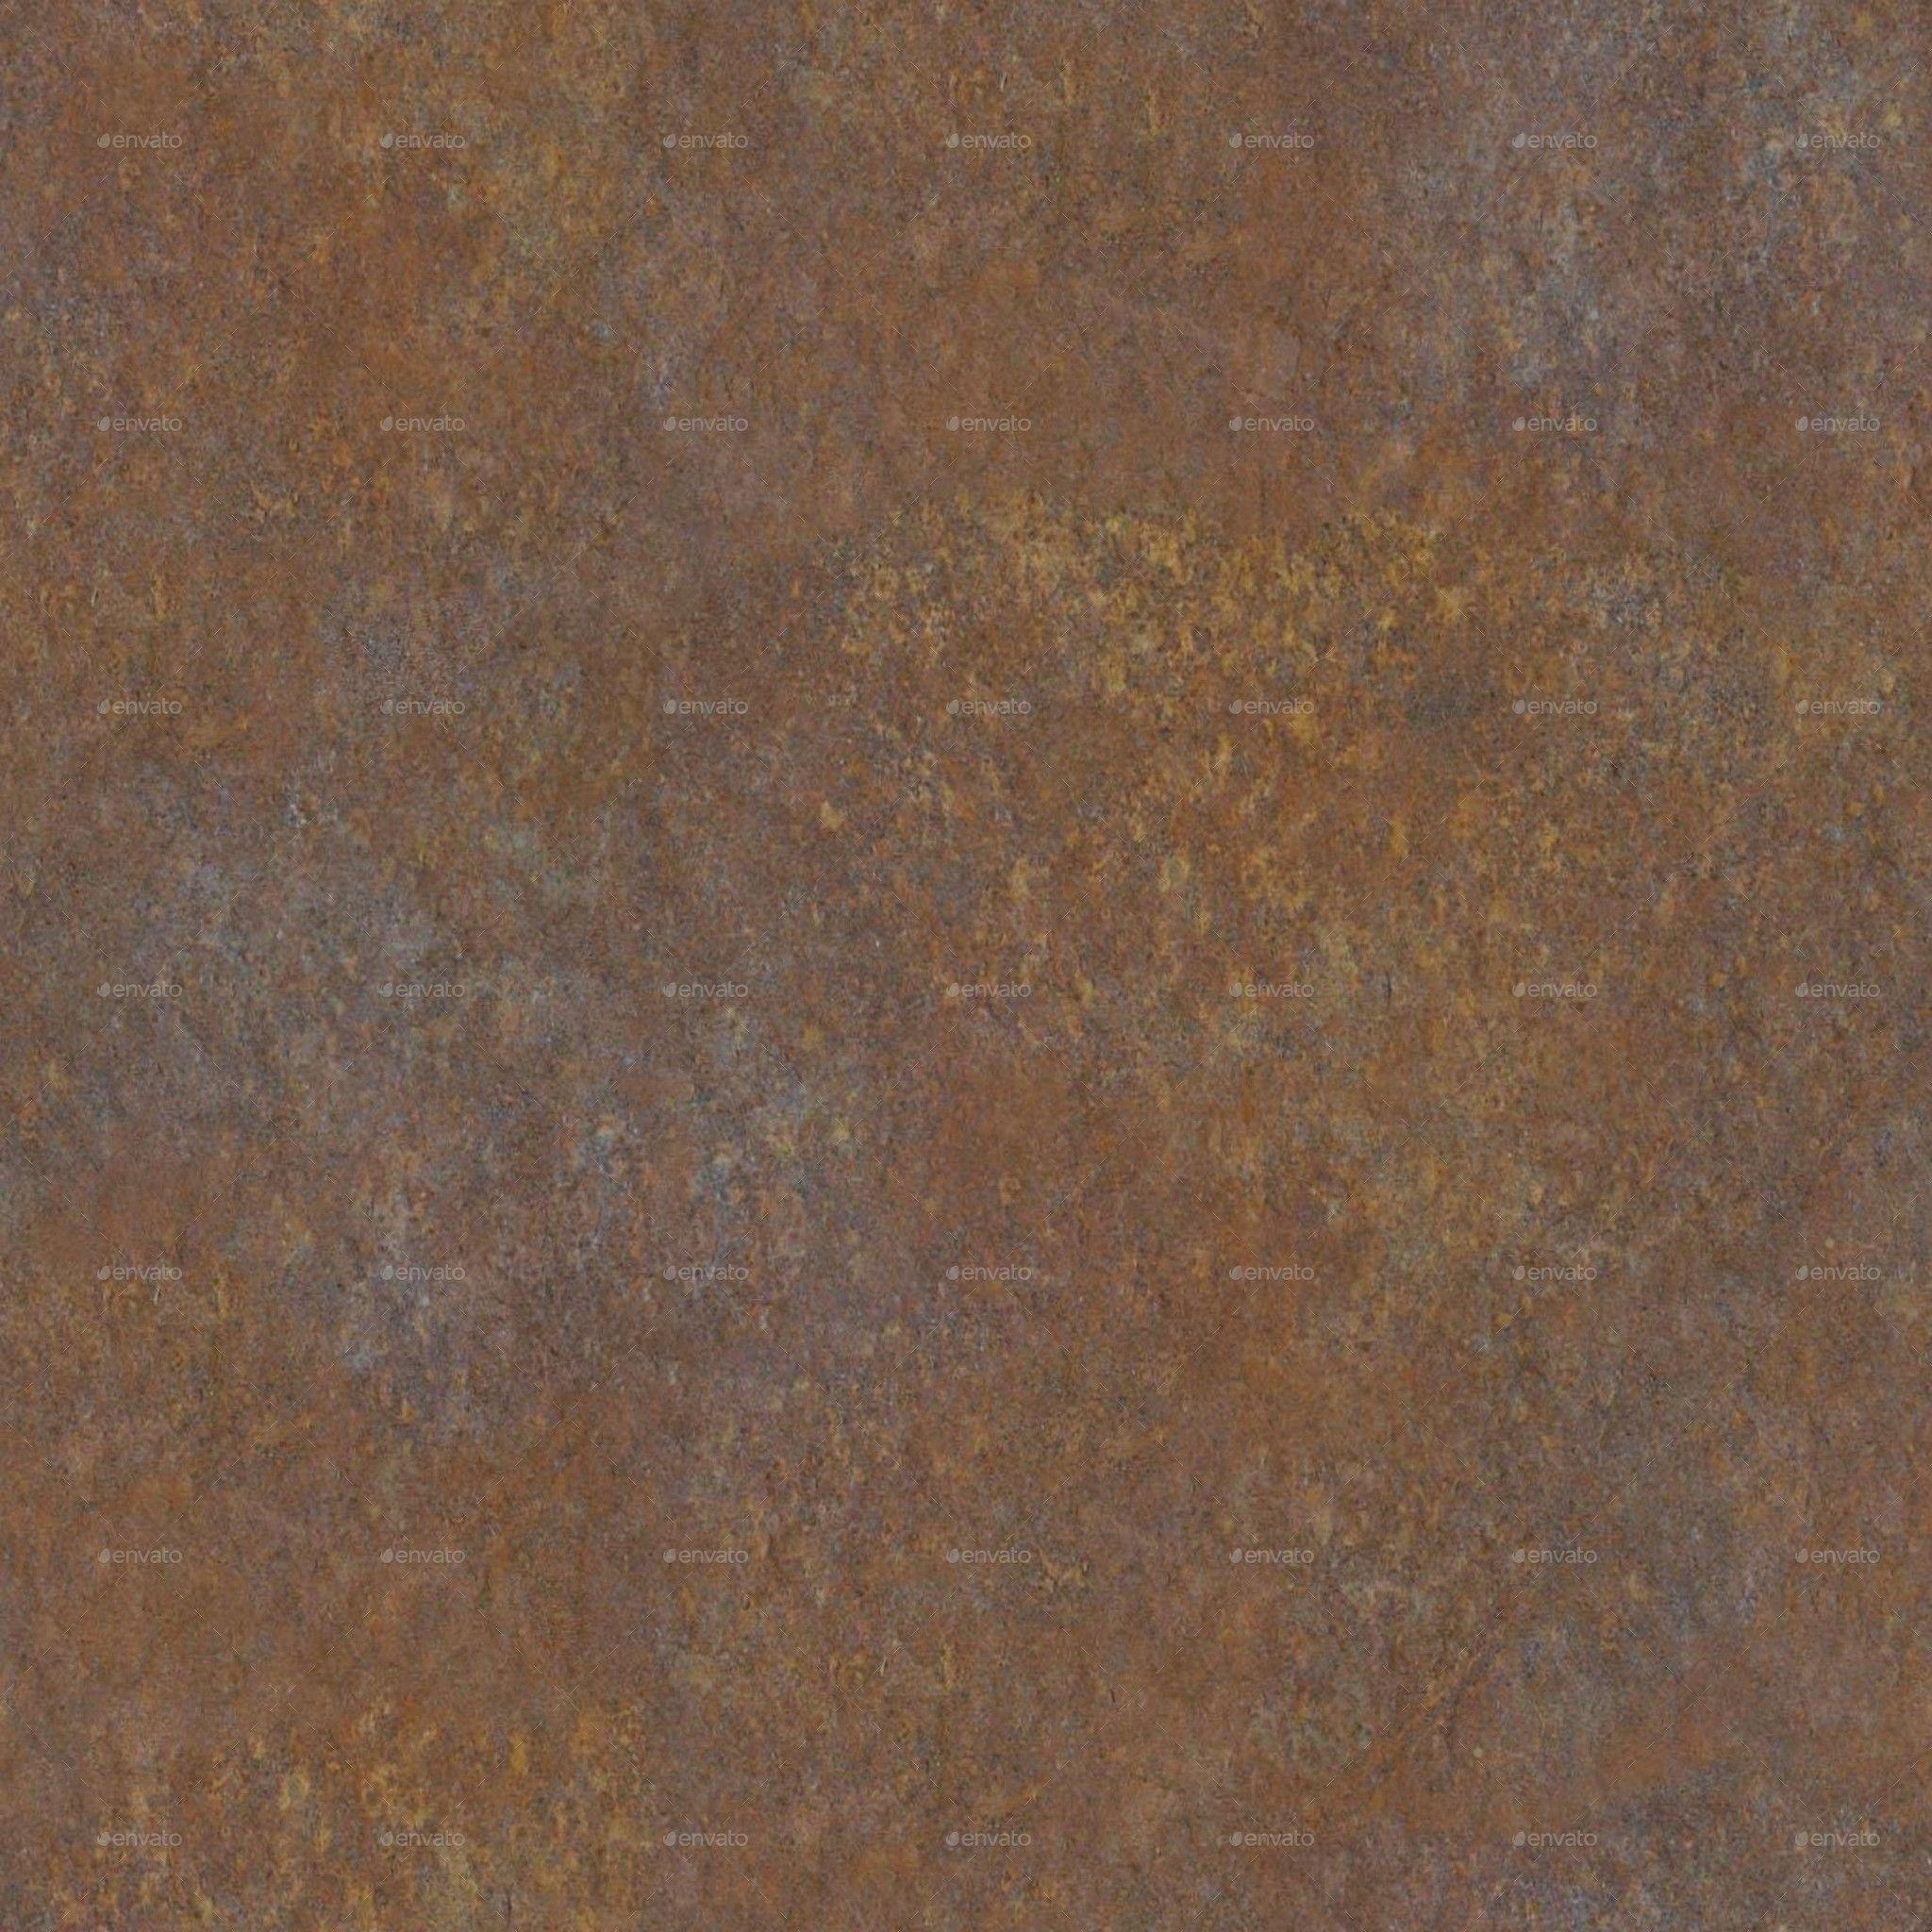 Rusty Metal Texture Seamless Rusty Metal Sea...